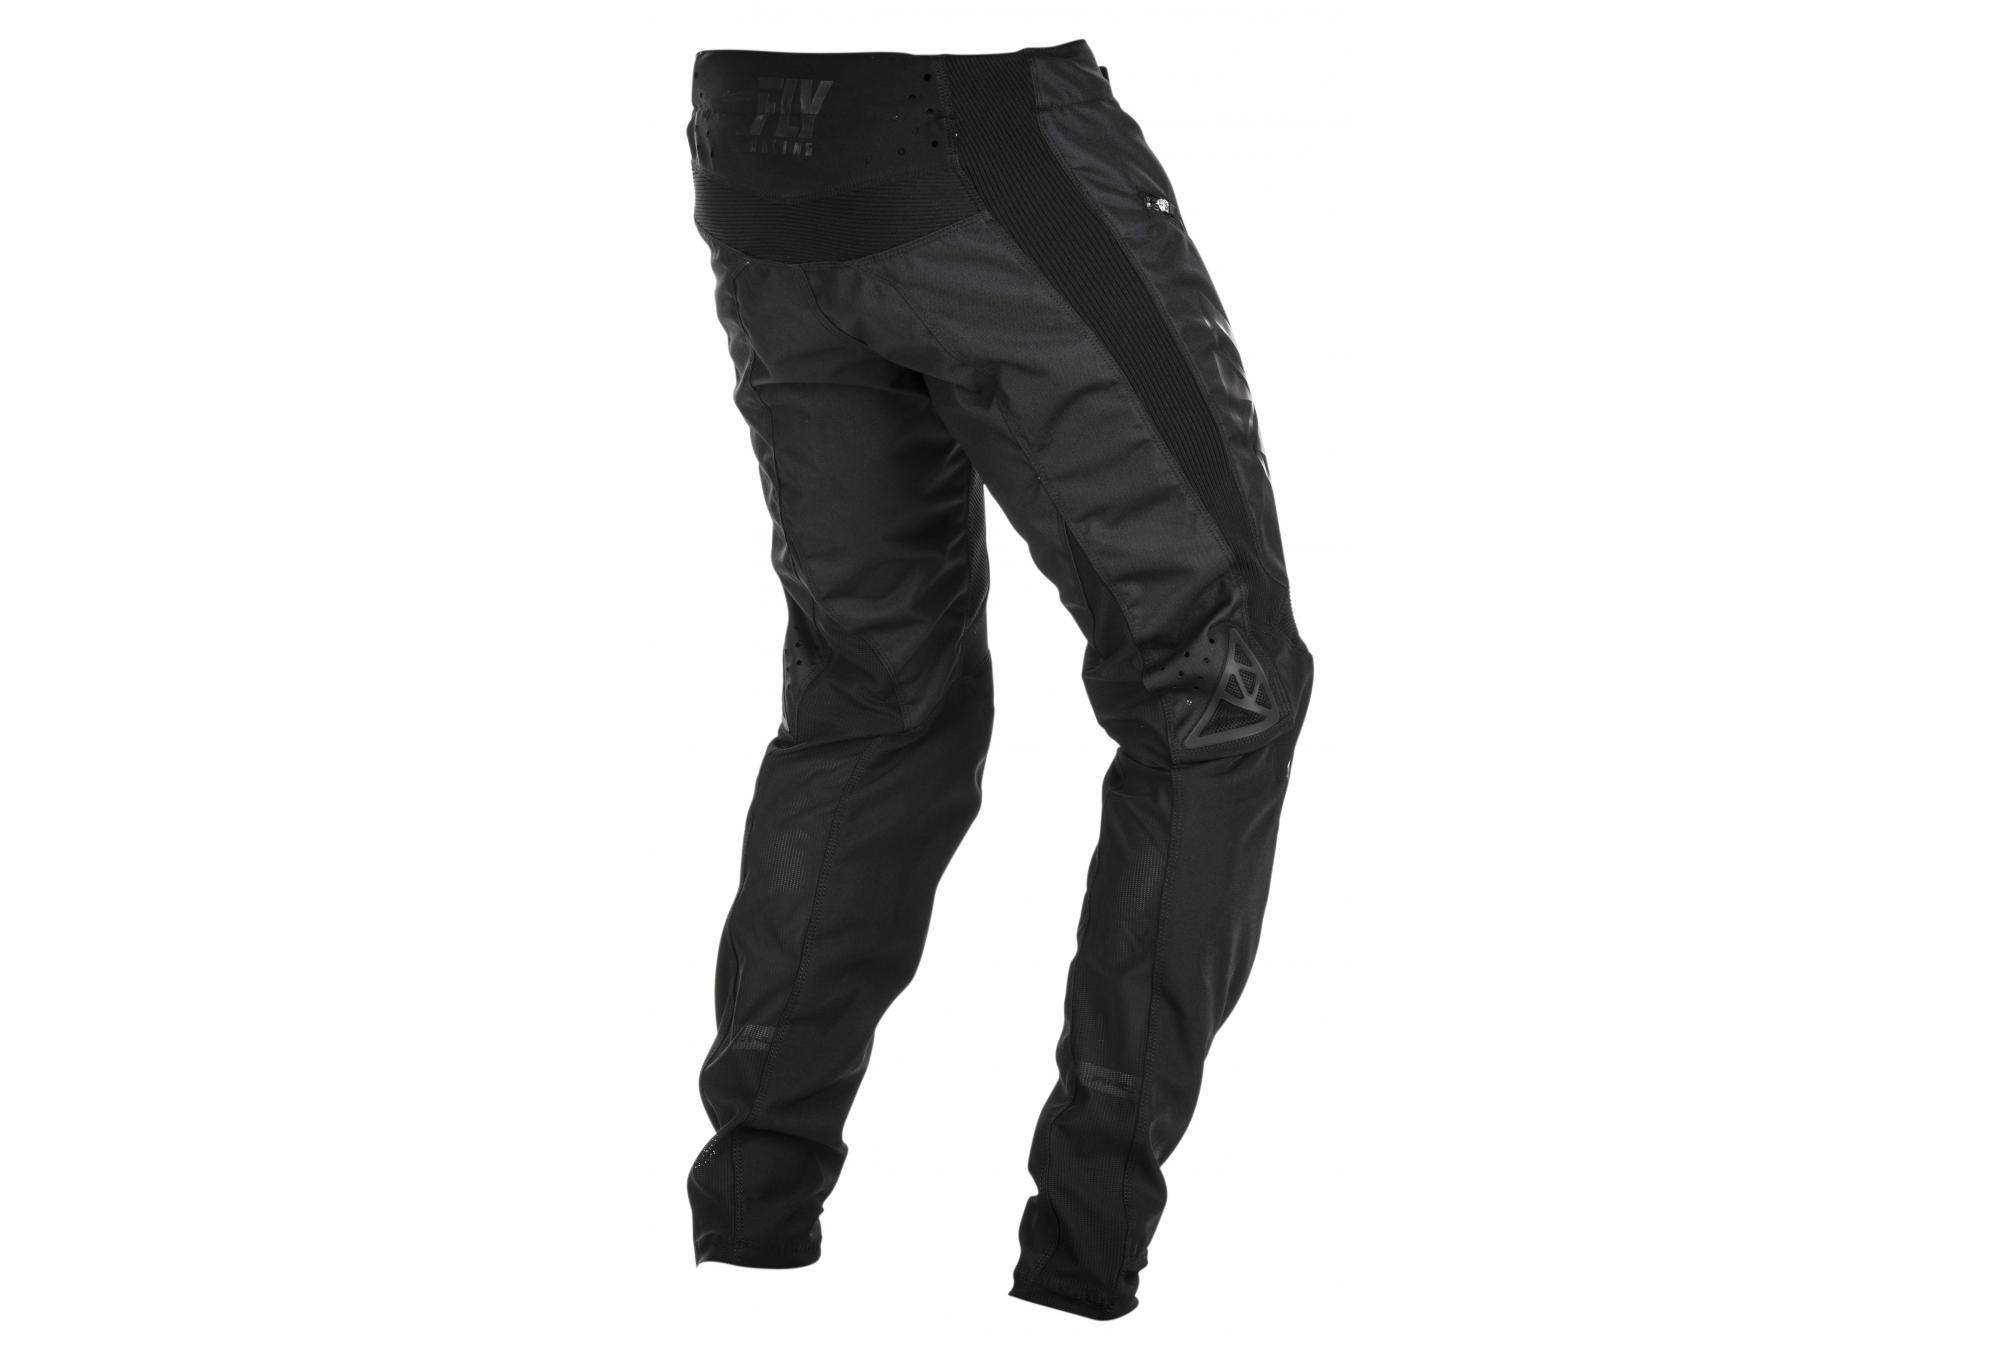 Fly Racing Kinetic Shield Pant Black Size 30